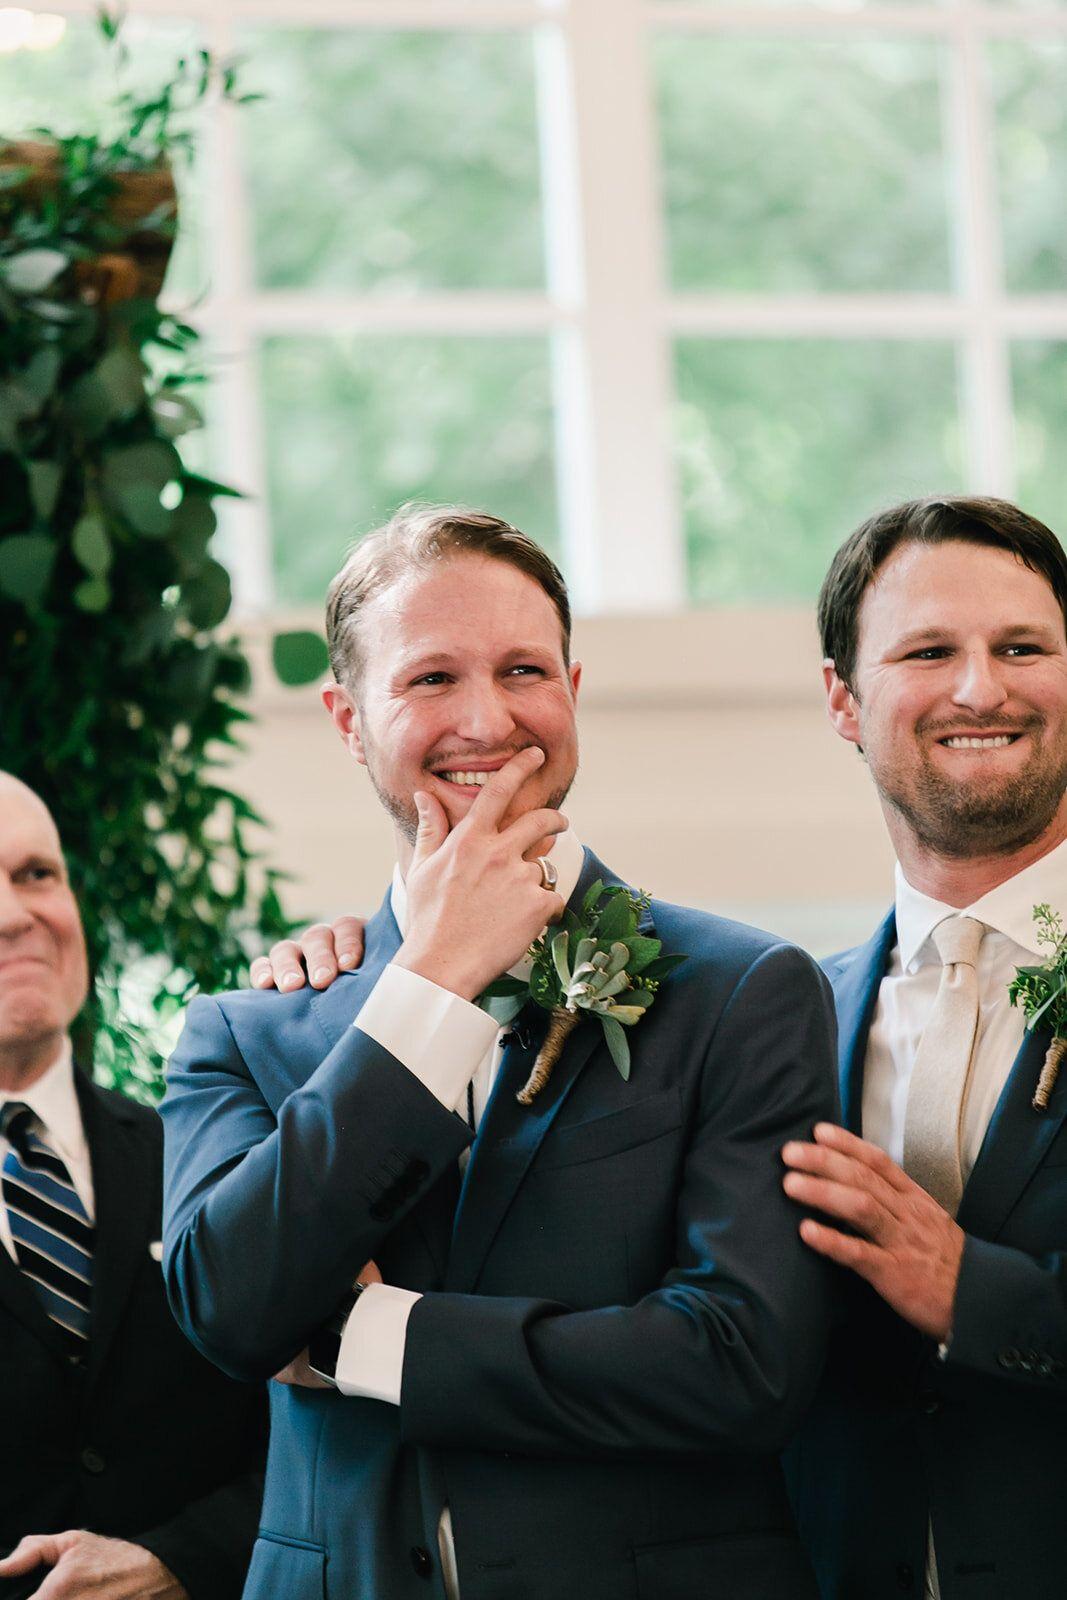 Weddings to Celebrate Allison & Callen's Carriage House